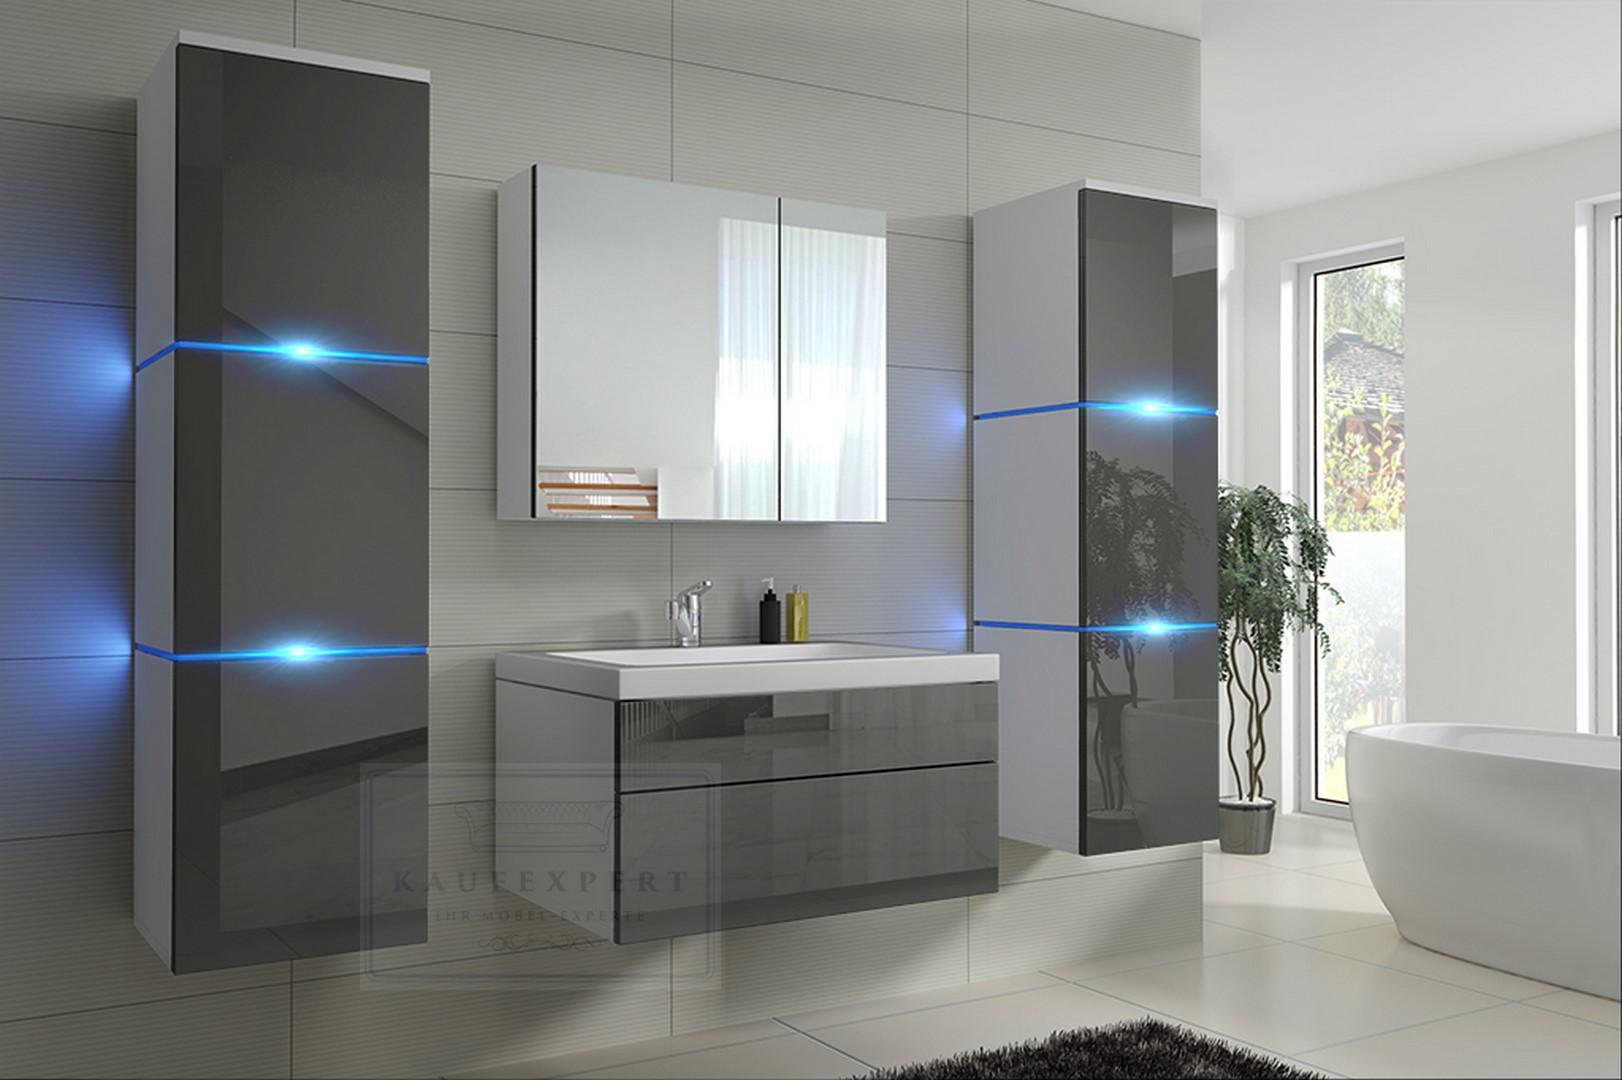 badm bel lux new mdf badezimmerm bel grau hochglanz wei keramikbecken led ebay. Black Bedroom Furniture Sets. Home Design Ideas